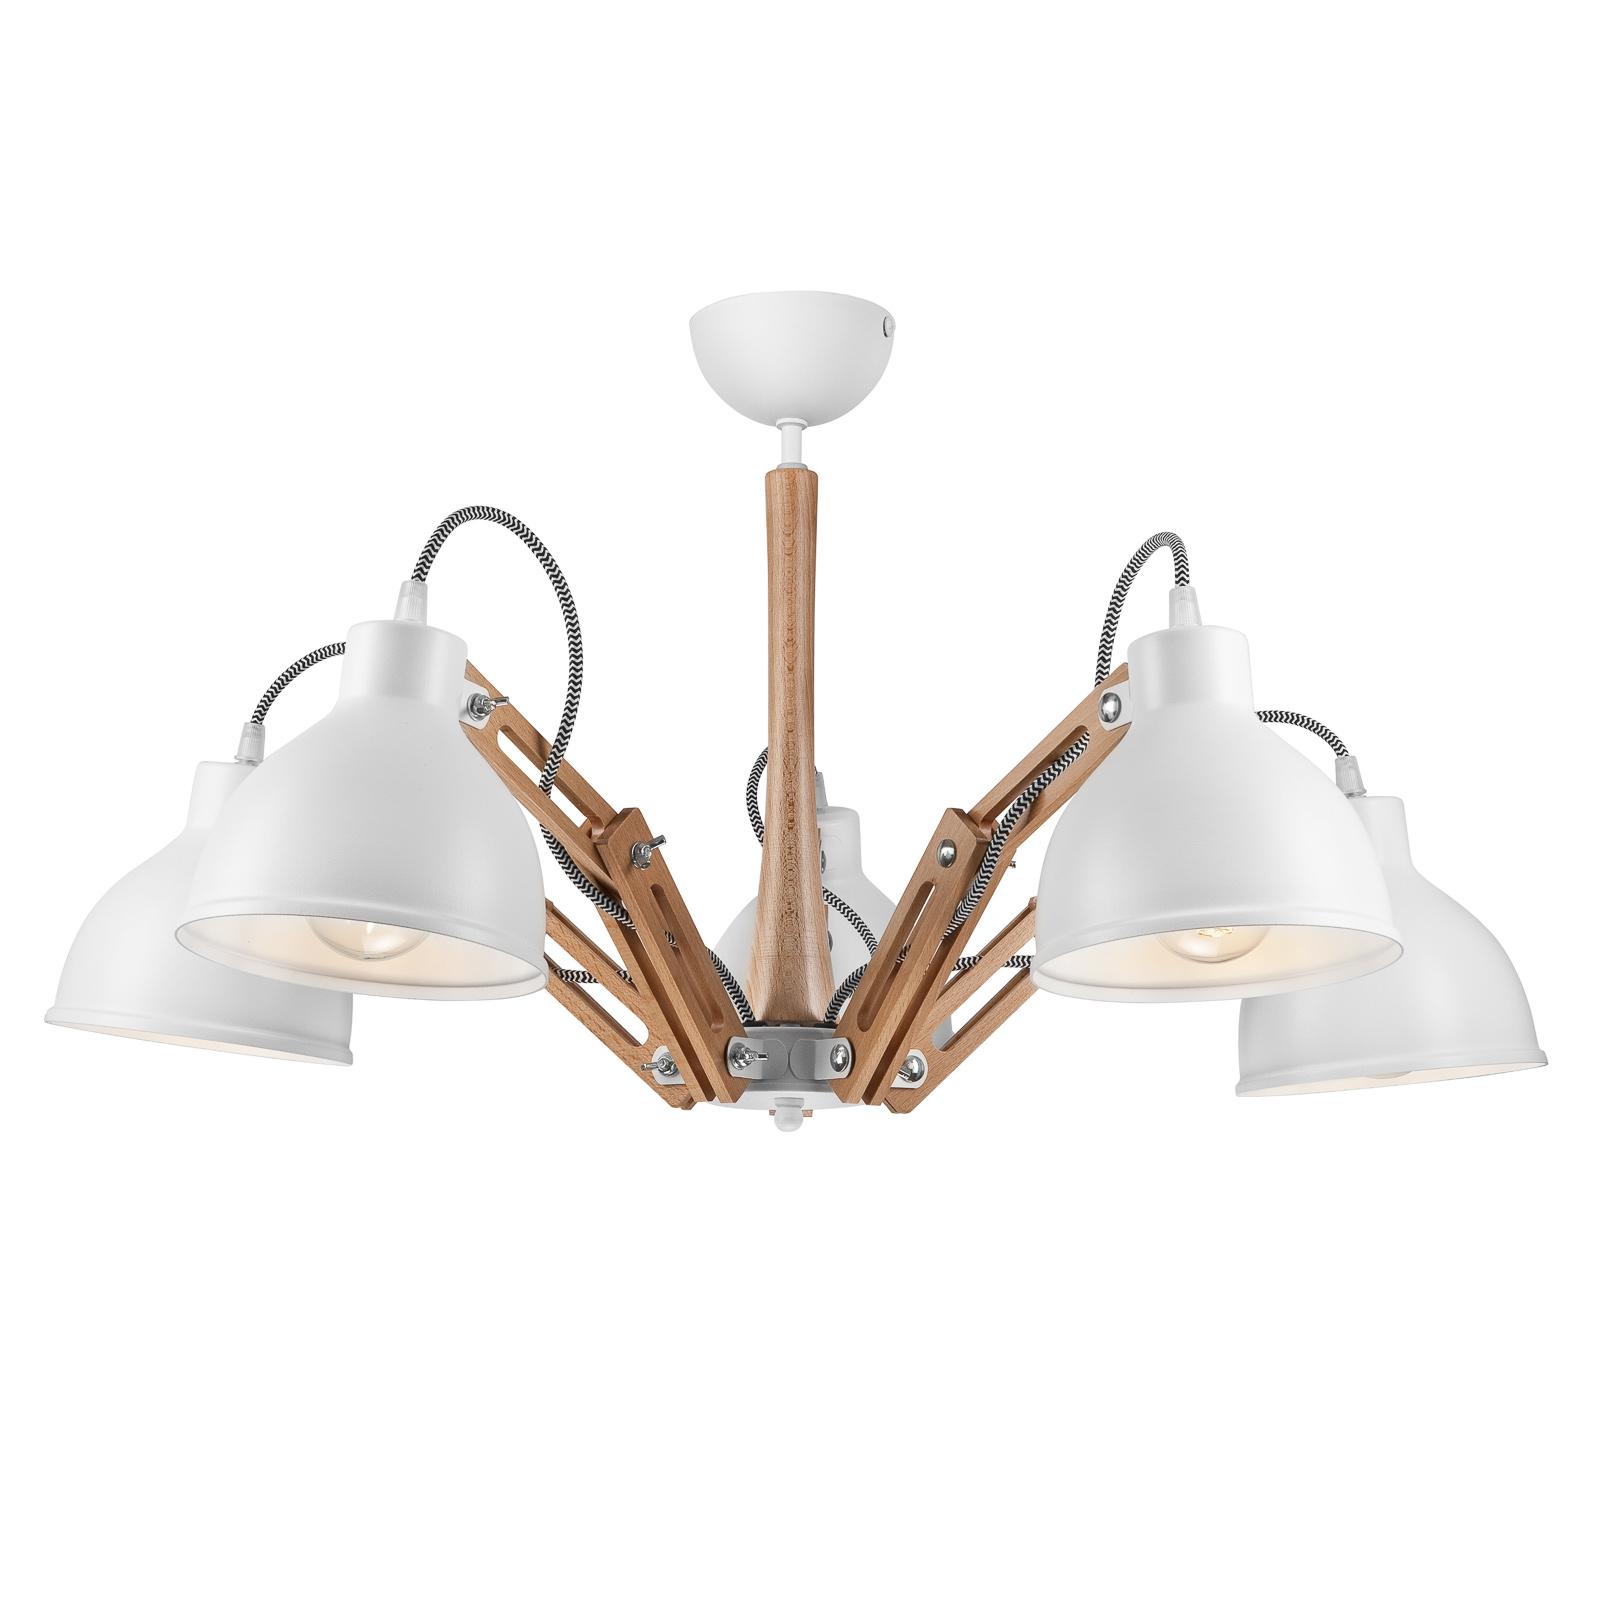 Taklampe Skansen 5 lyskilder justerbar, hvit